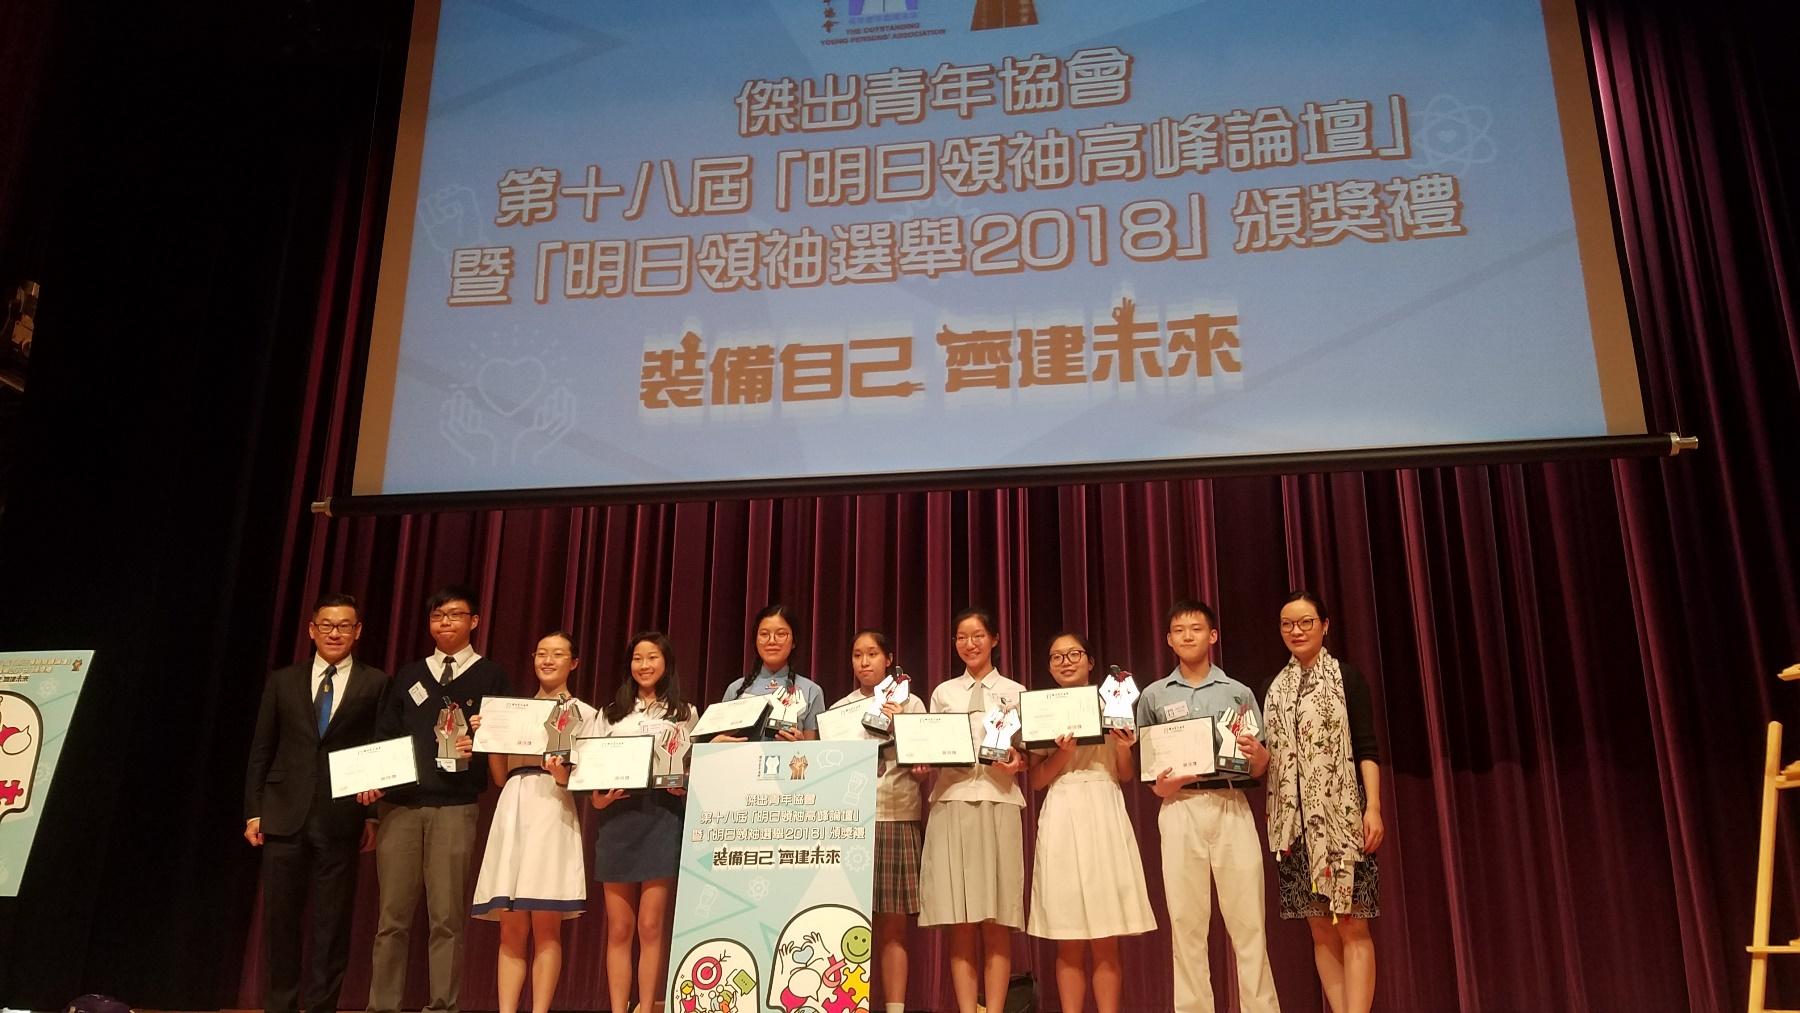 http://npc.edu.hk/sites/default/files/20180705_170013.jpg